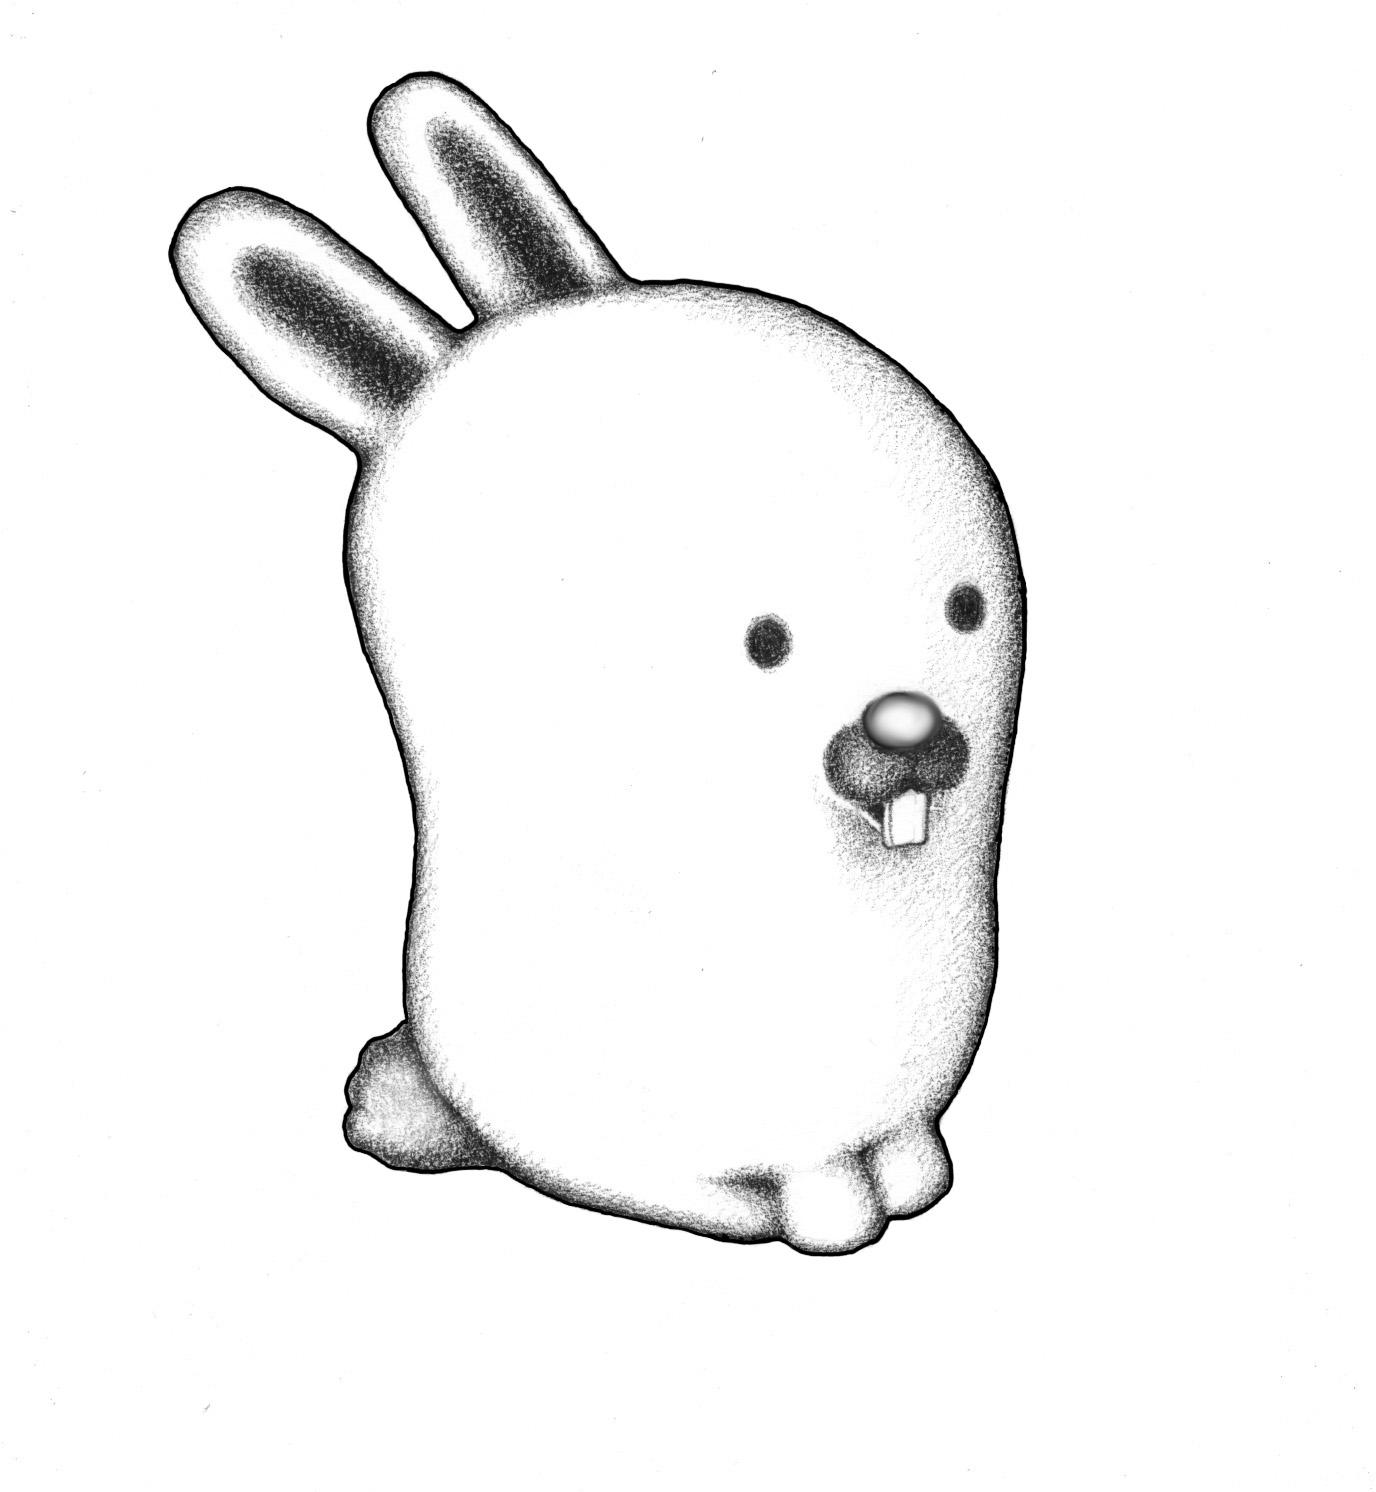 glenda the plan 9 bunny